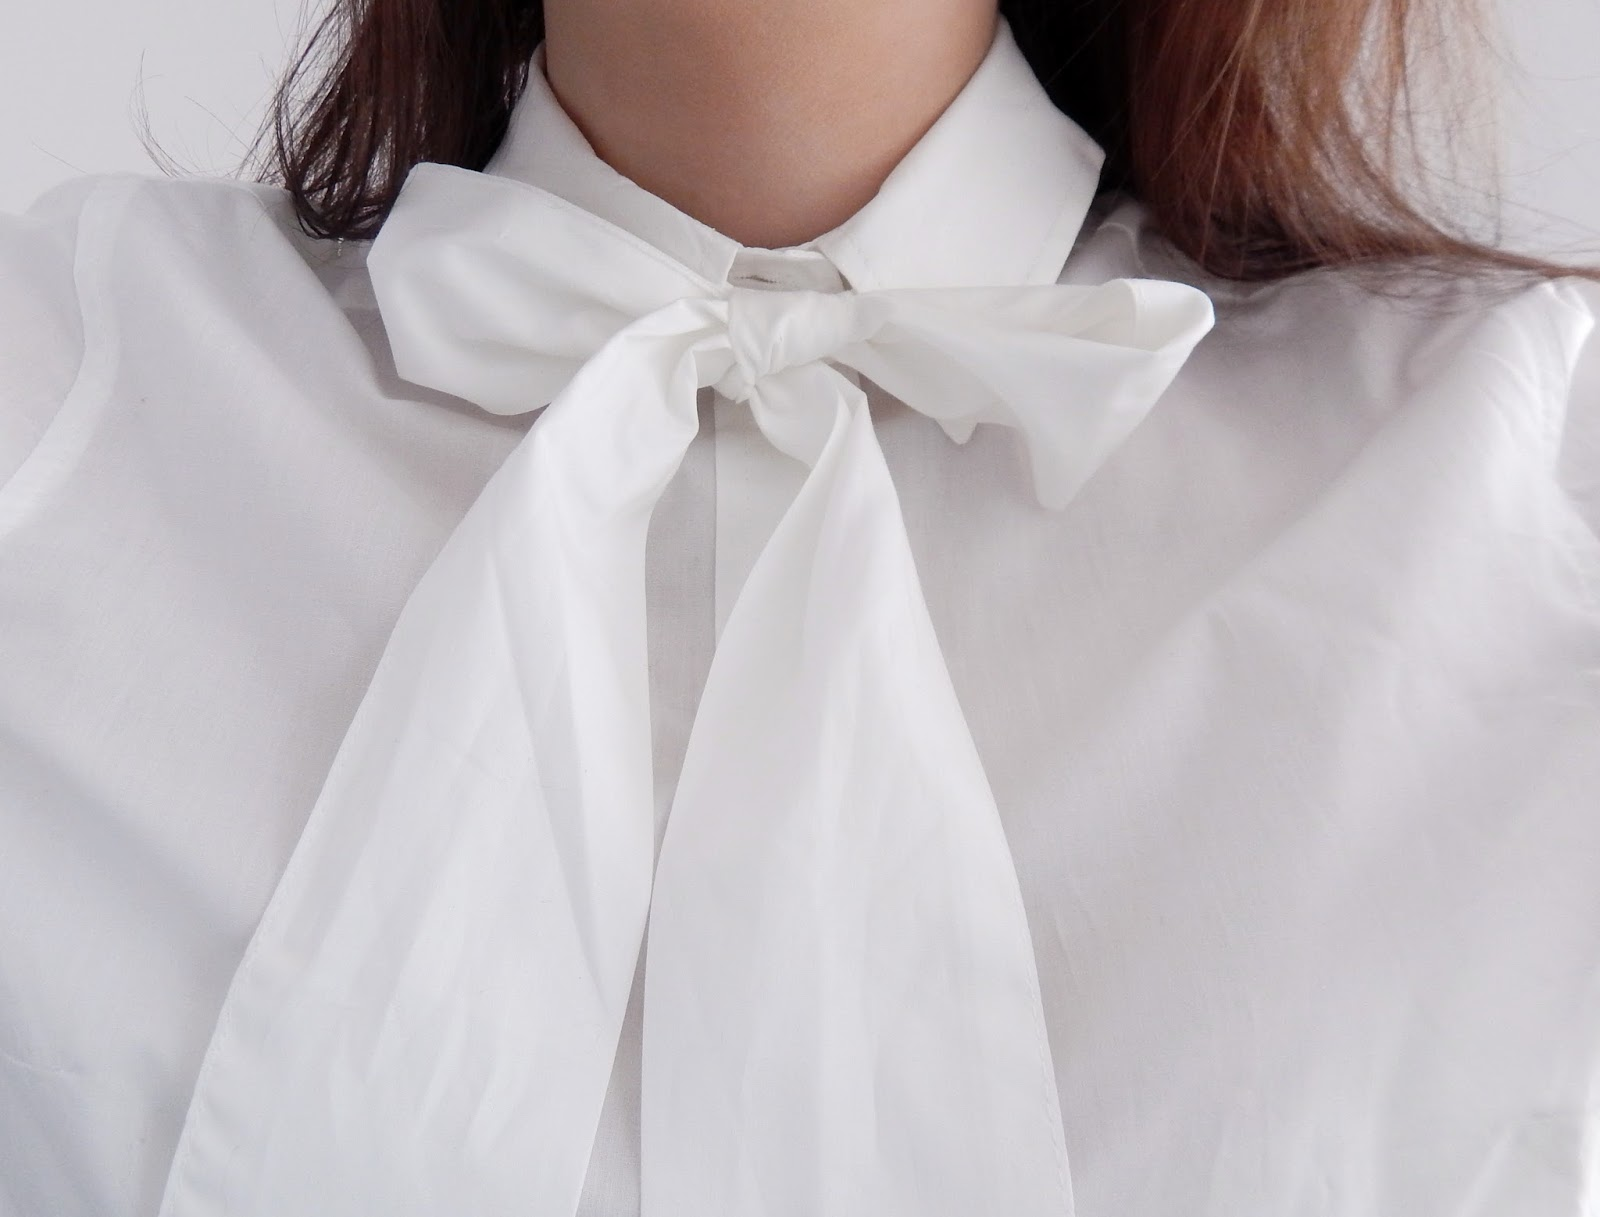 biała koszula detal